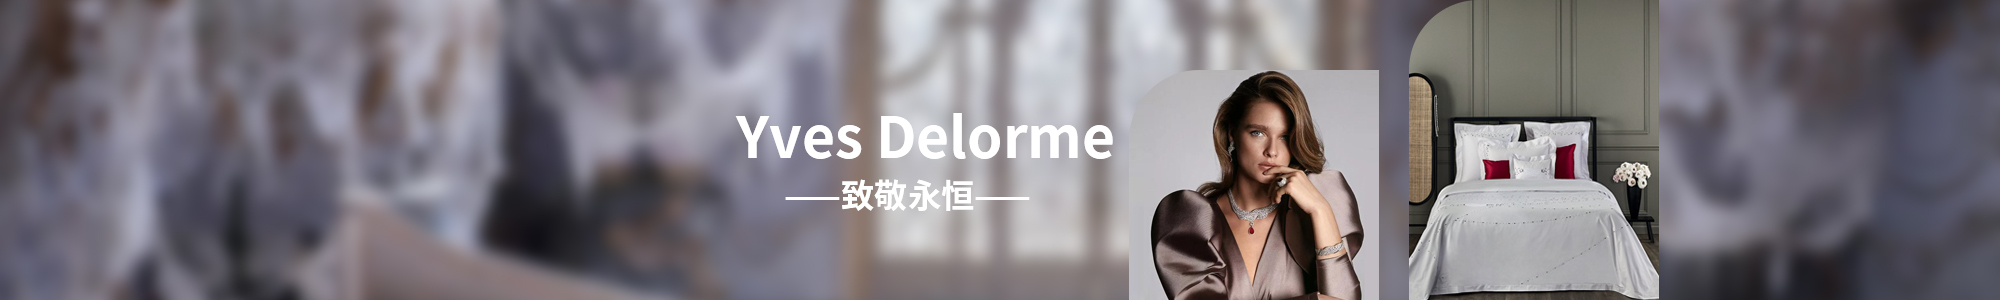 Yves Delorme致敬永恒